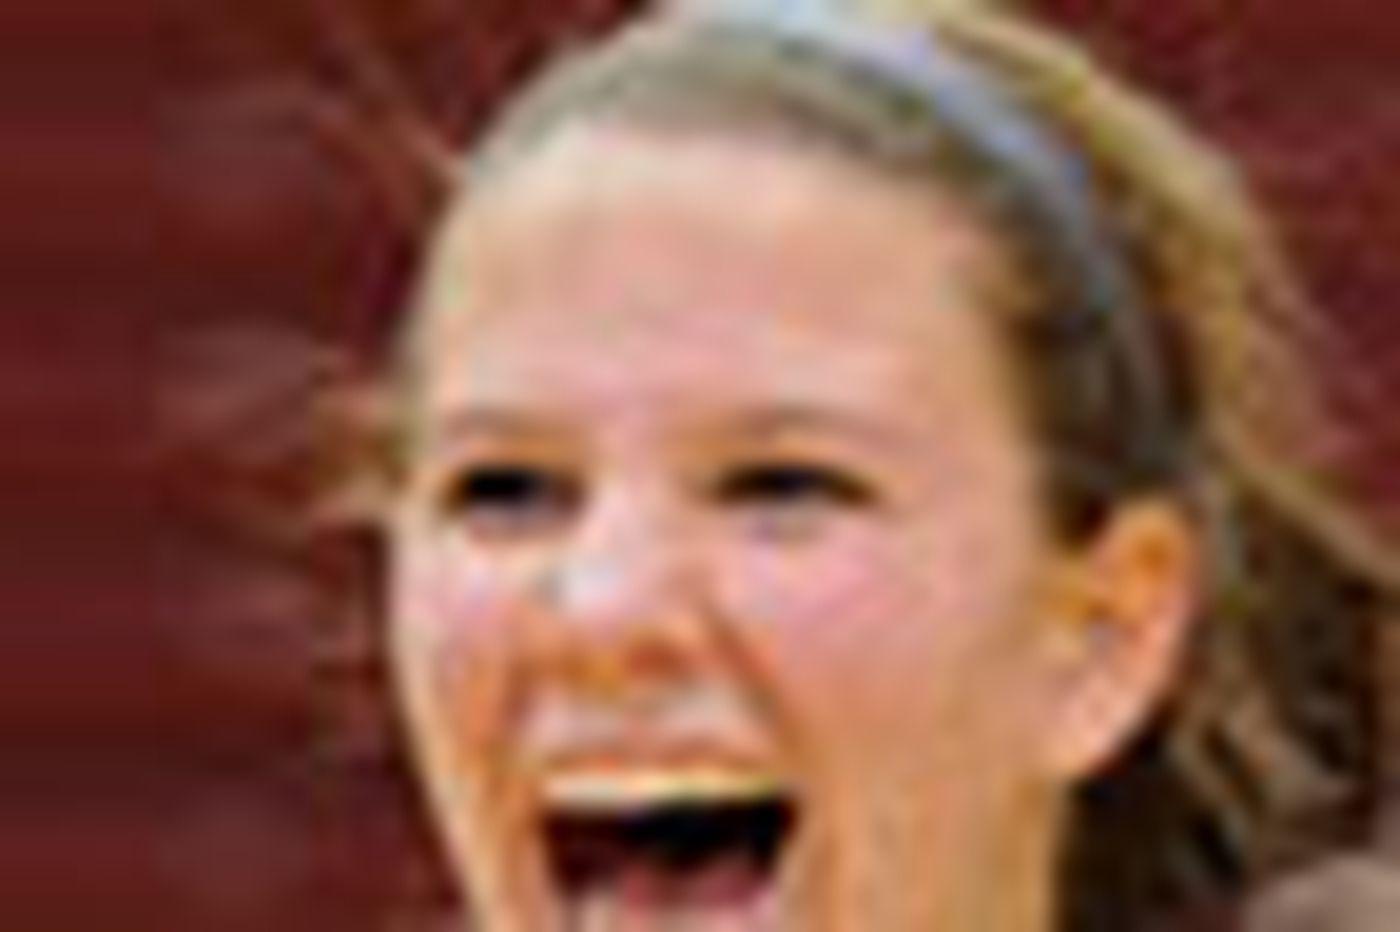 Coley Ricci helps Garnet Valley to 4-1 start in girls' basketball